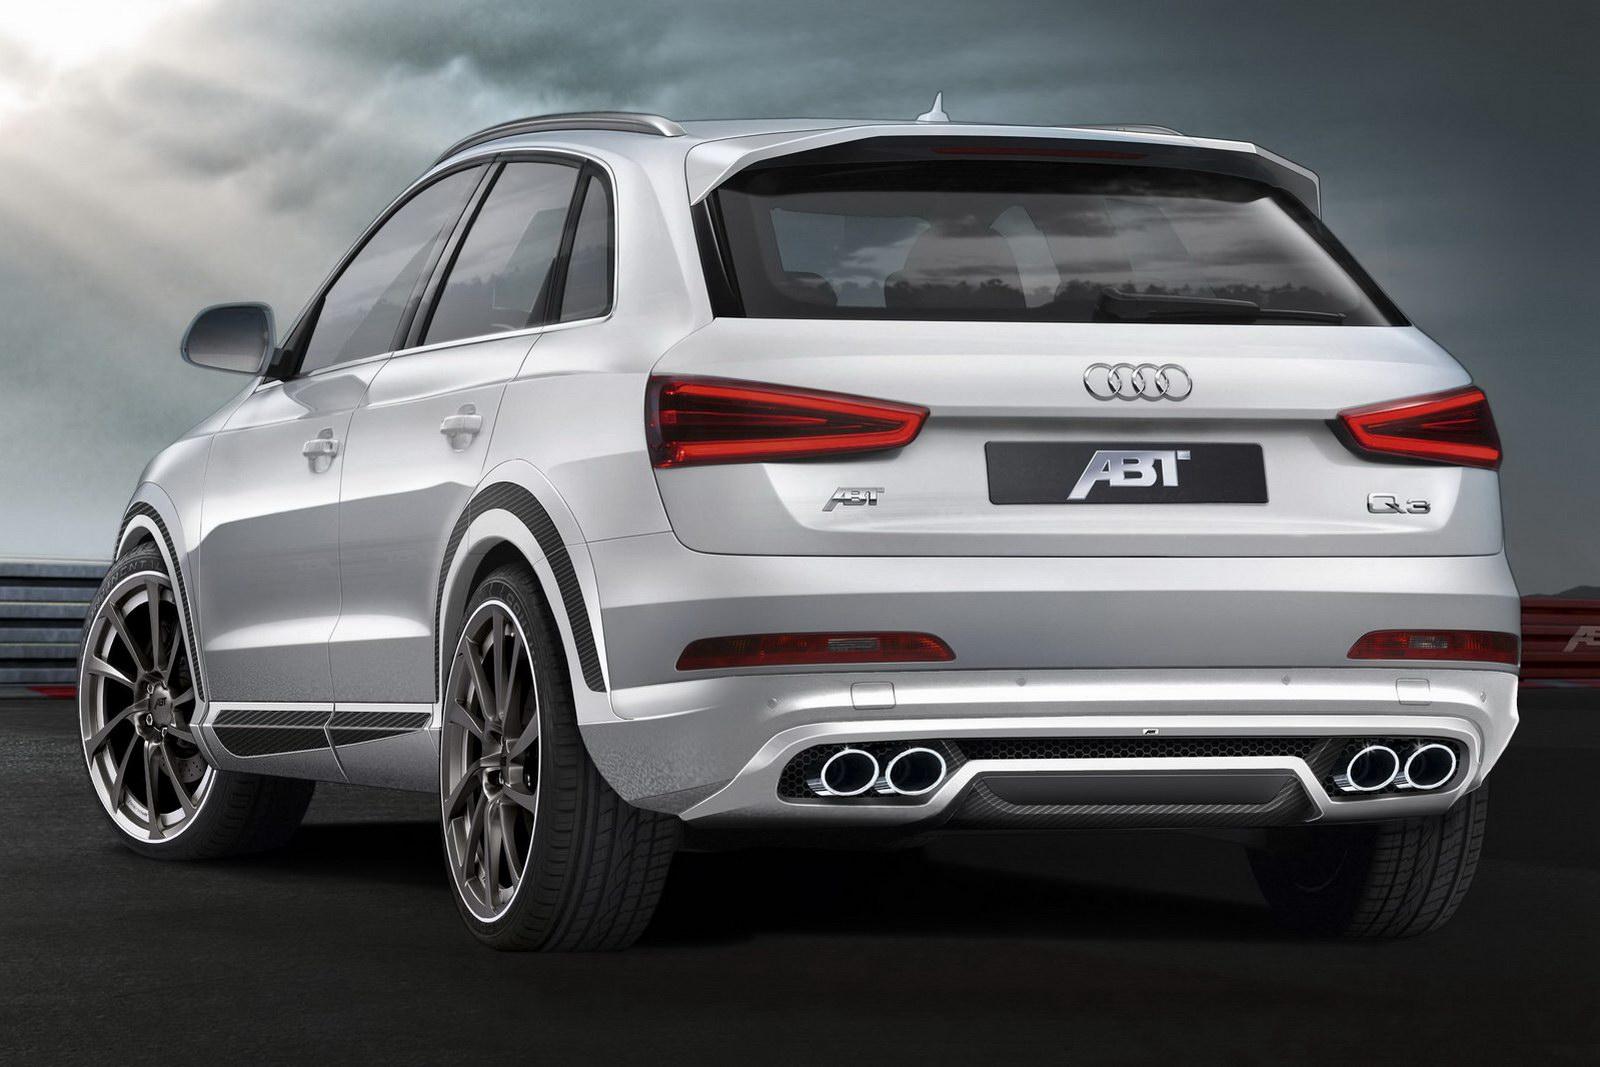 ABT si pohrál s Audi Q3 4